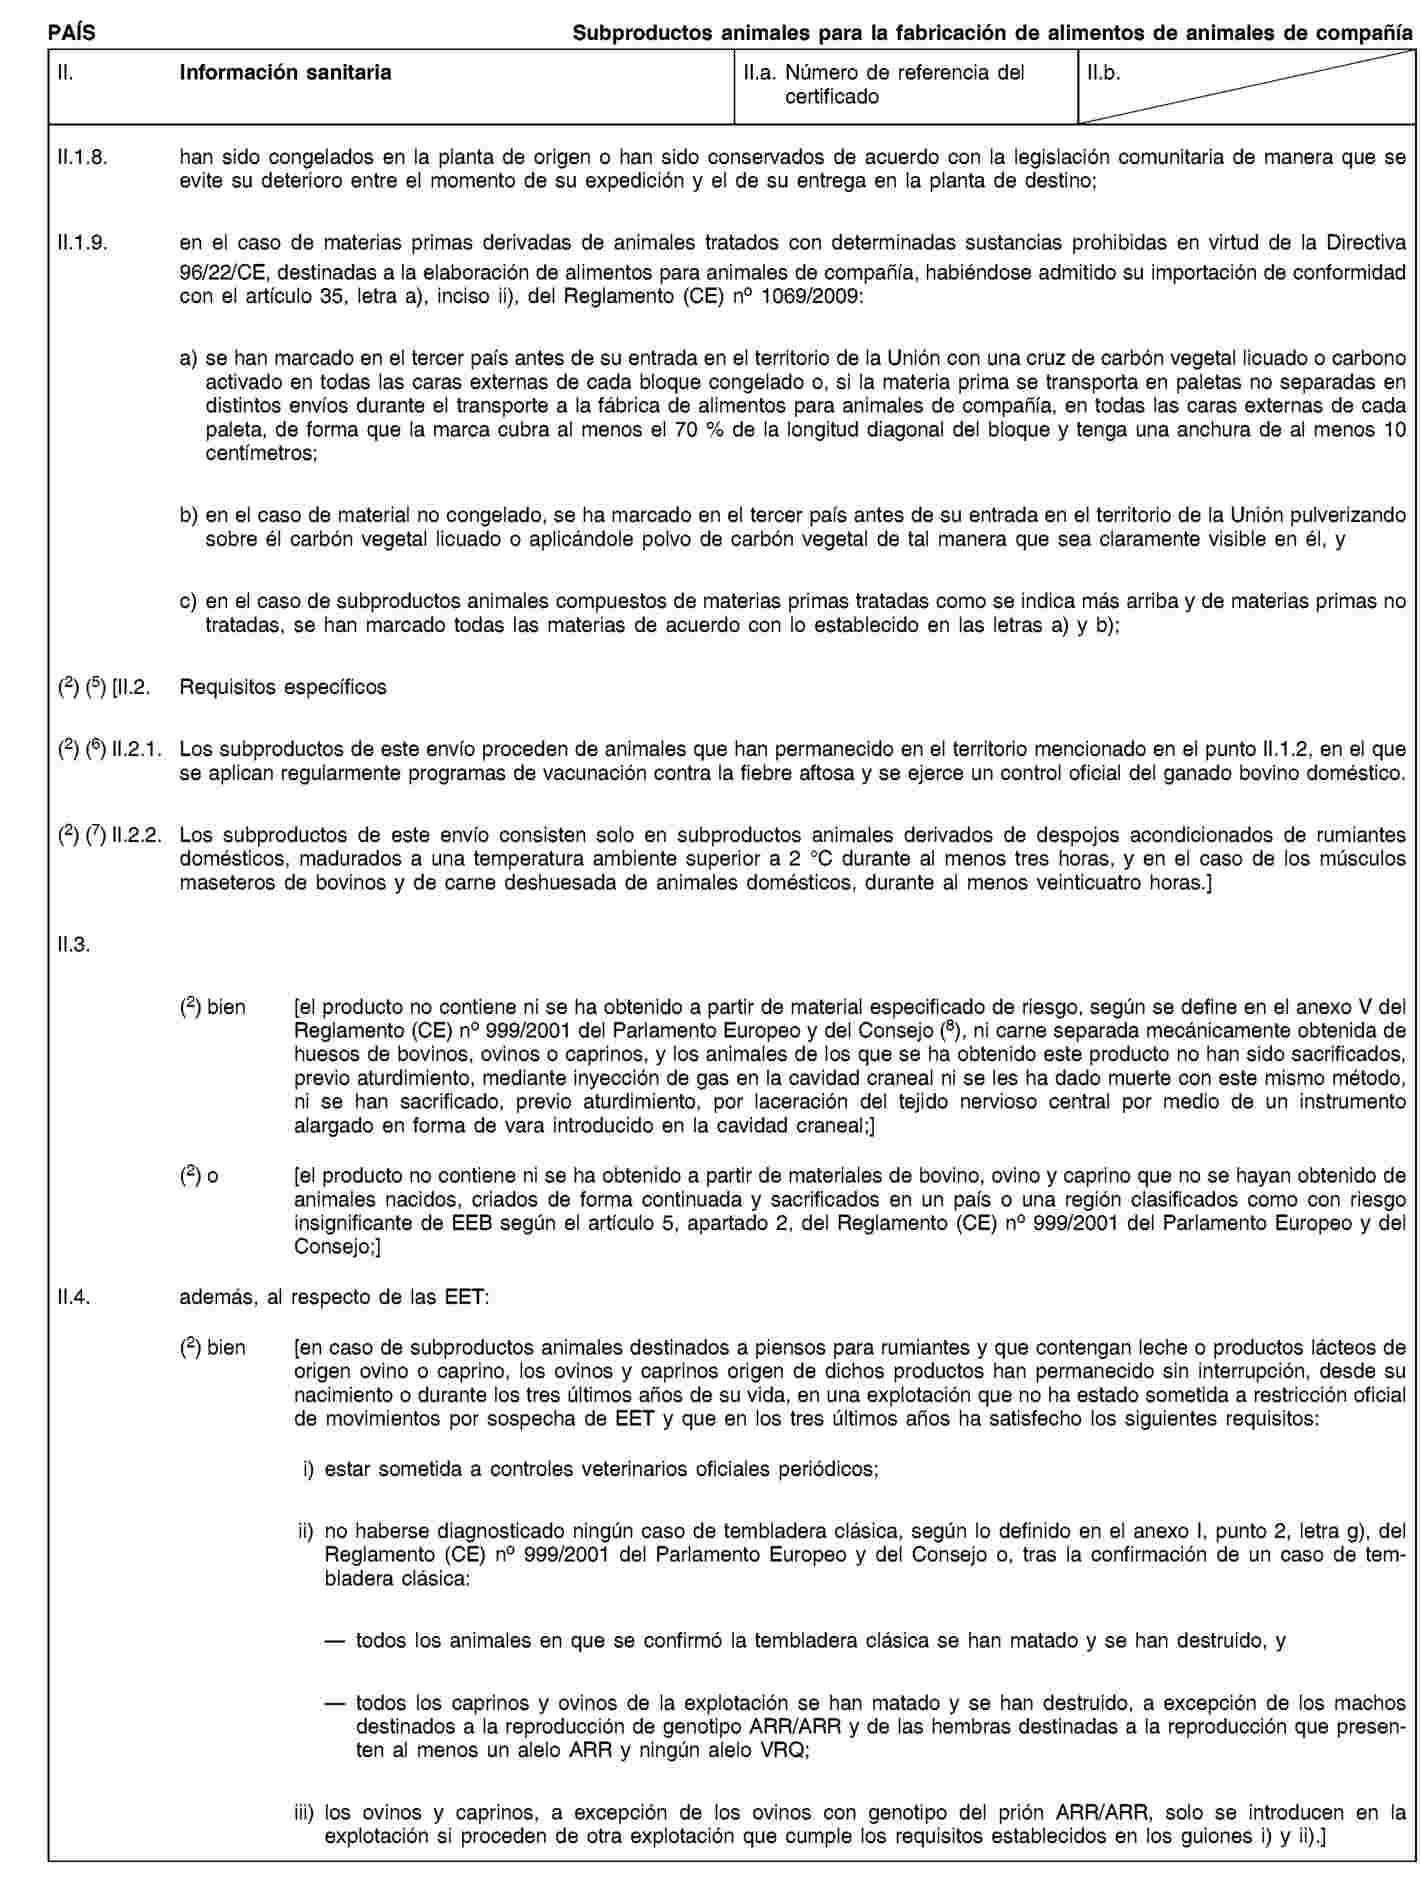 Imagen: https://eur-lex.europa.eu/resource.html?uri=uriserv:OJ.L_.2011.054.01.0001.01.SPA.xhtml.L_2011054ES.01015801.tif.jpg